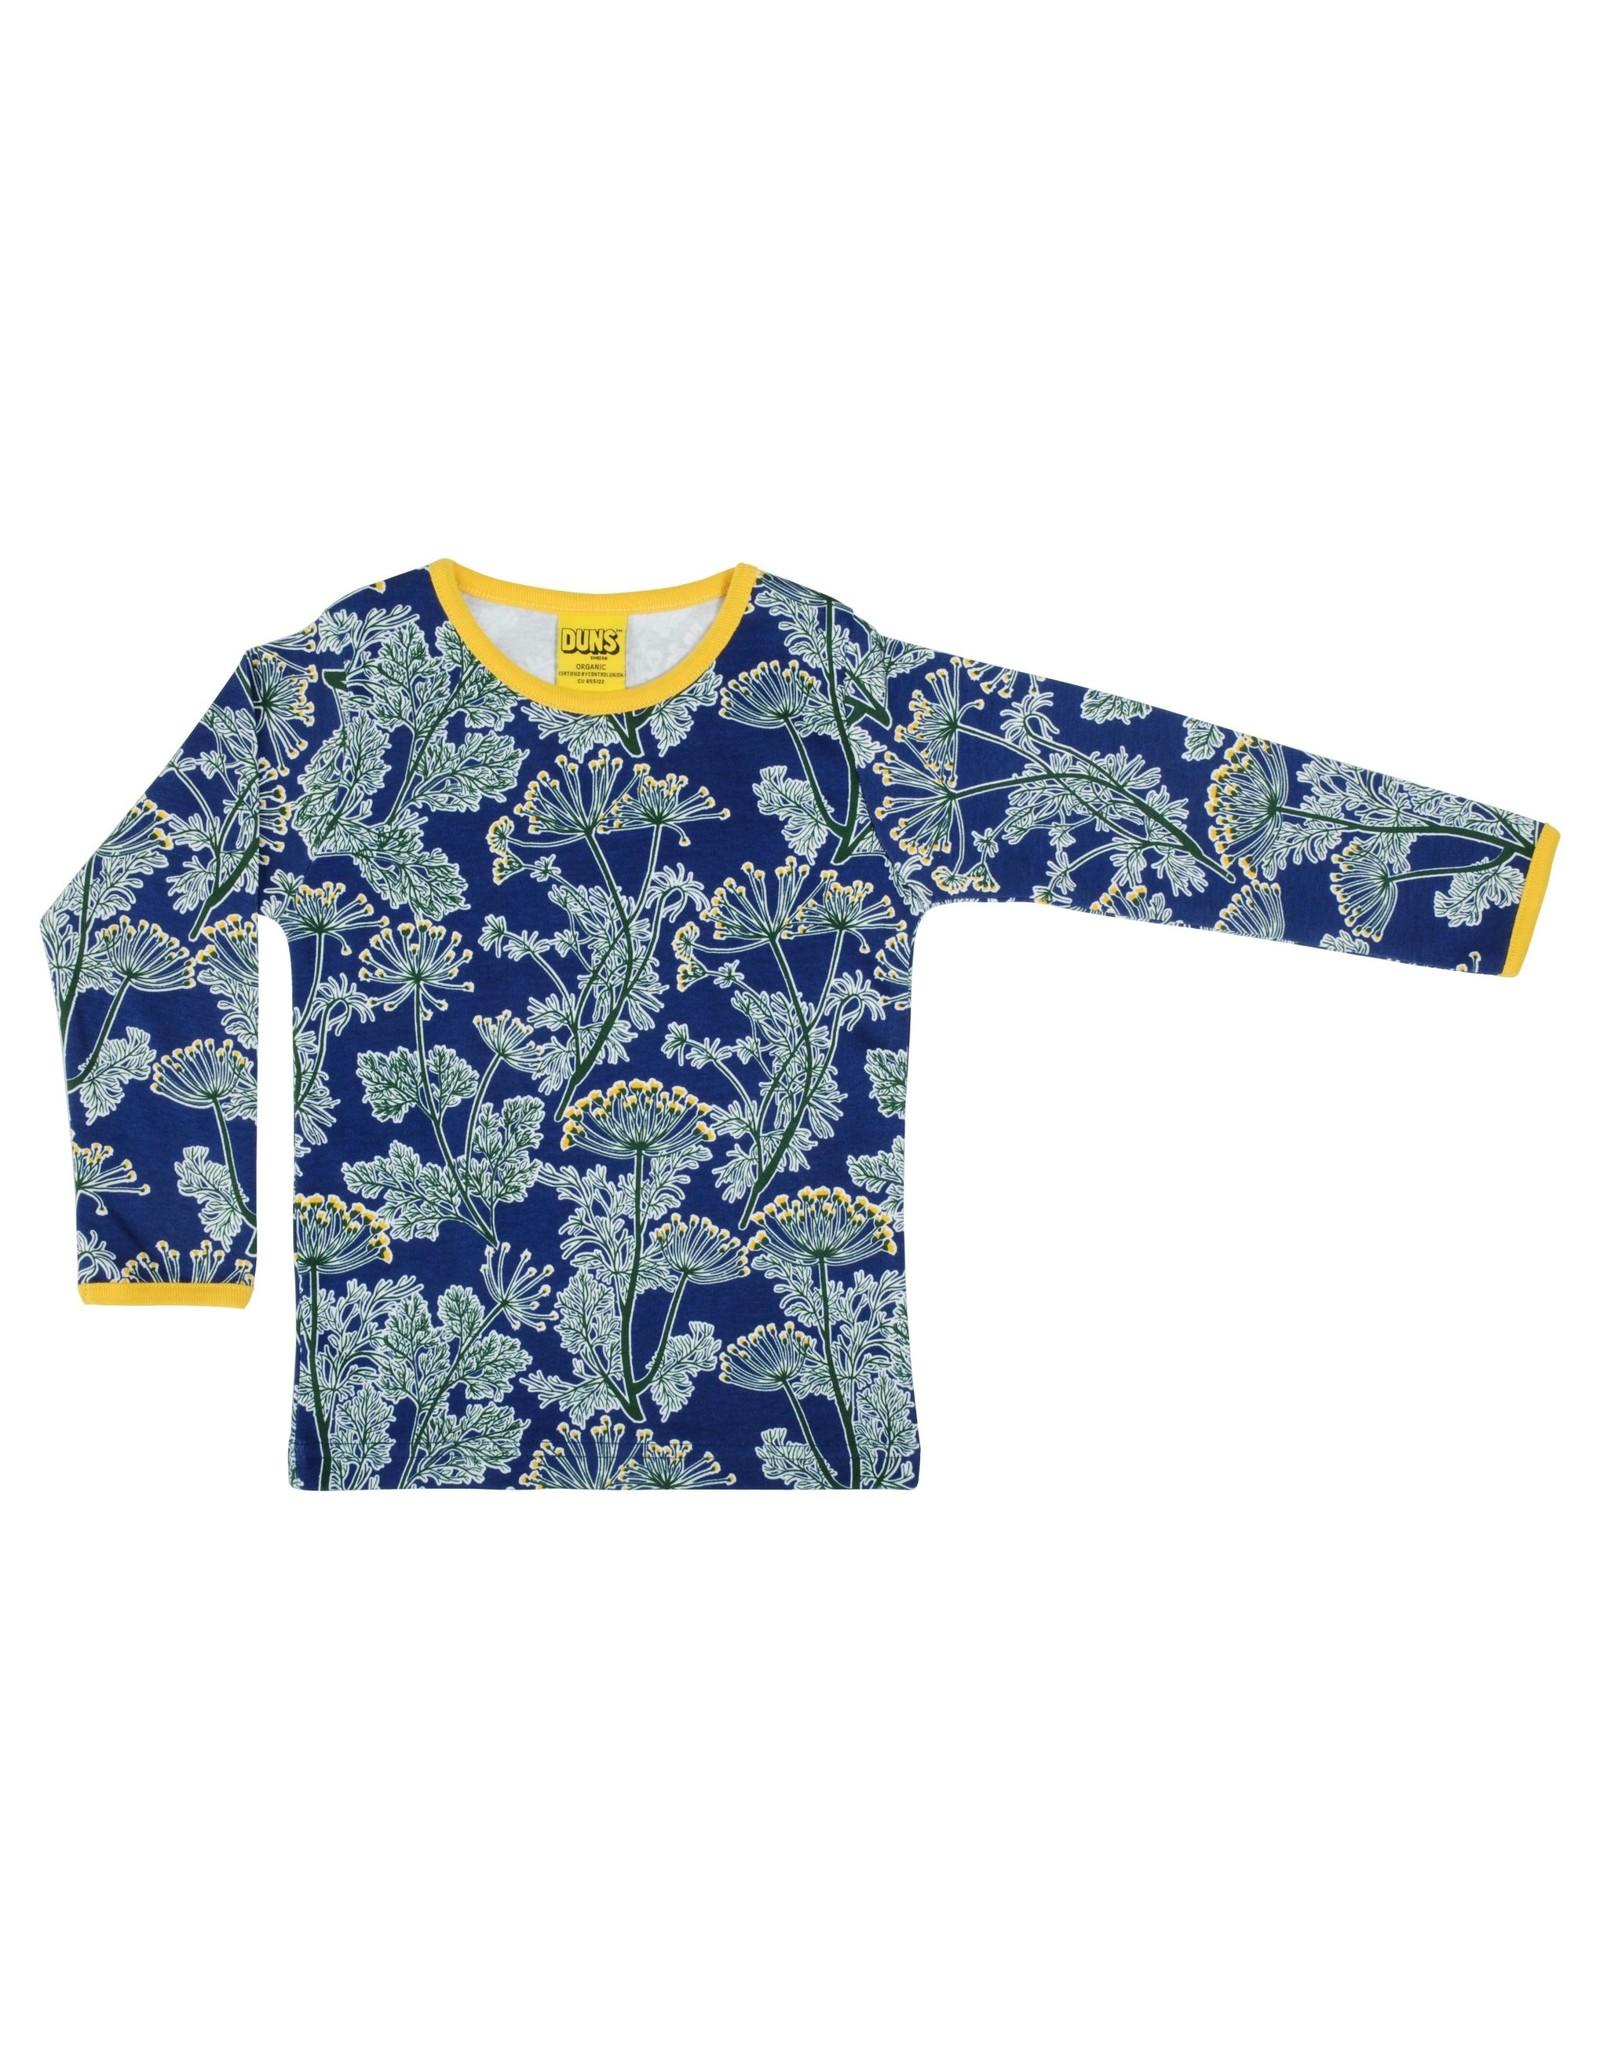 Duns Diepblauwe t-shirt met dille print